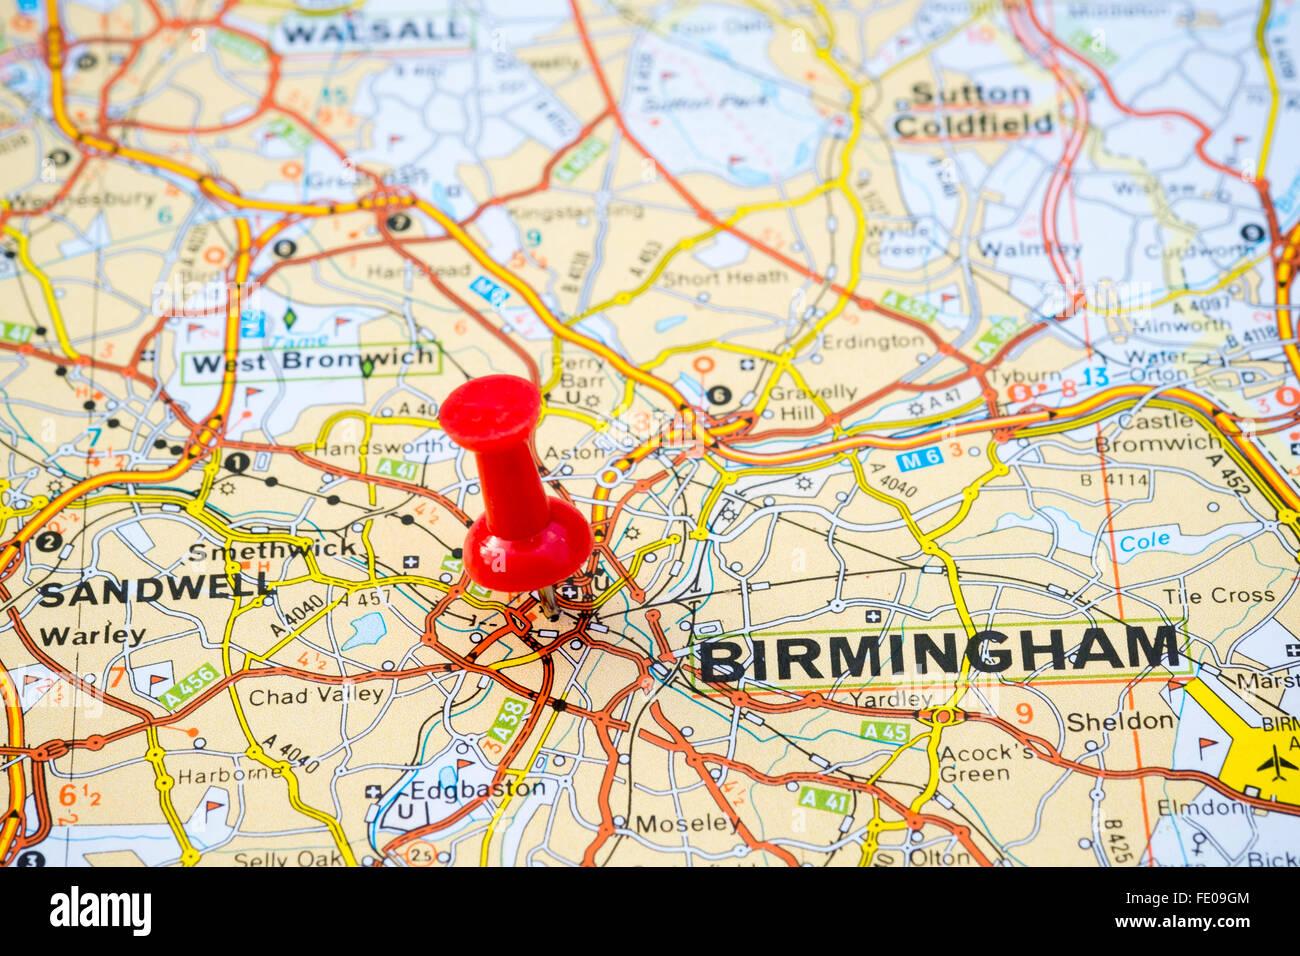 Map pin marking Birmingham City, United Kingdom. - Stock Image